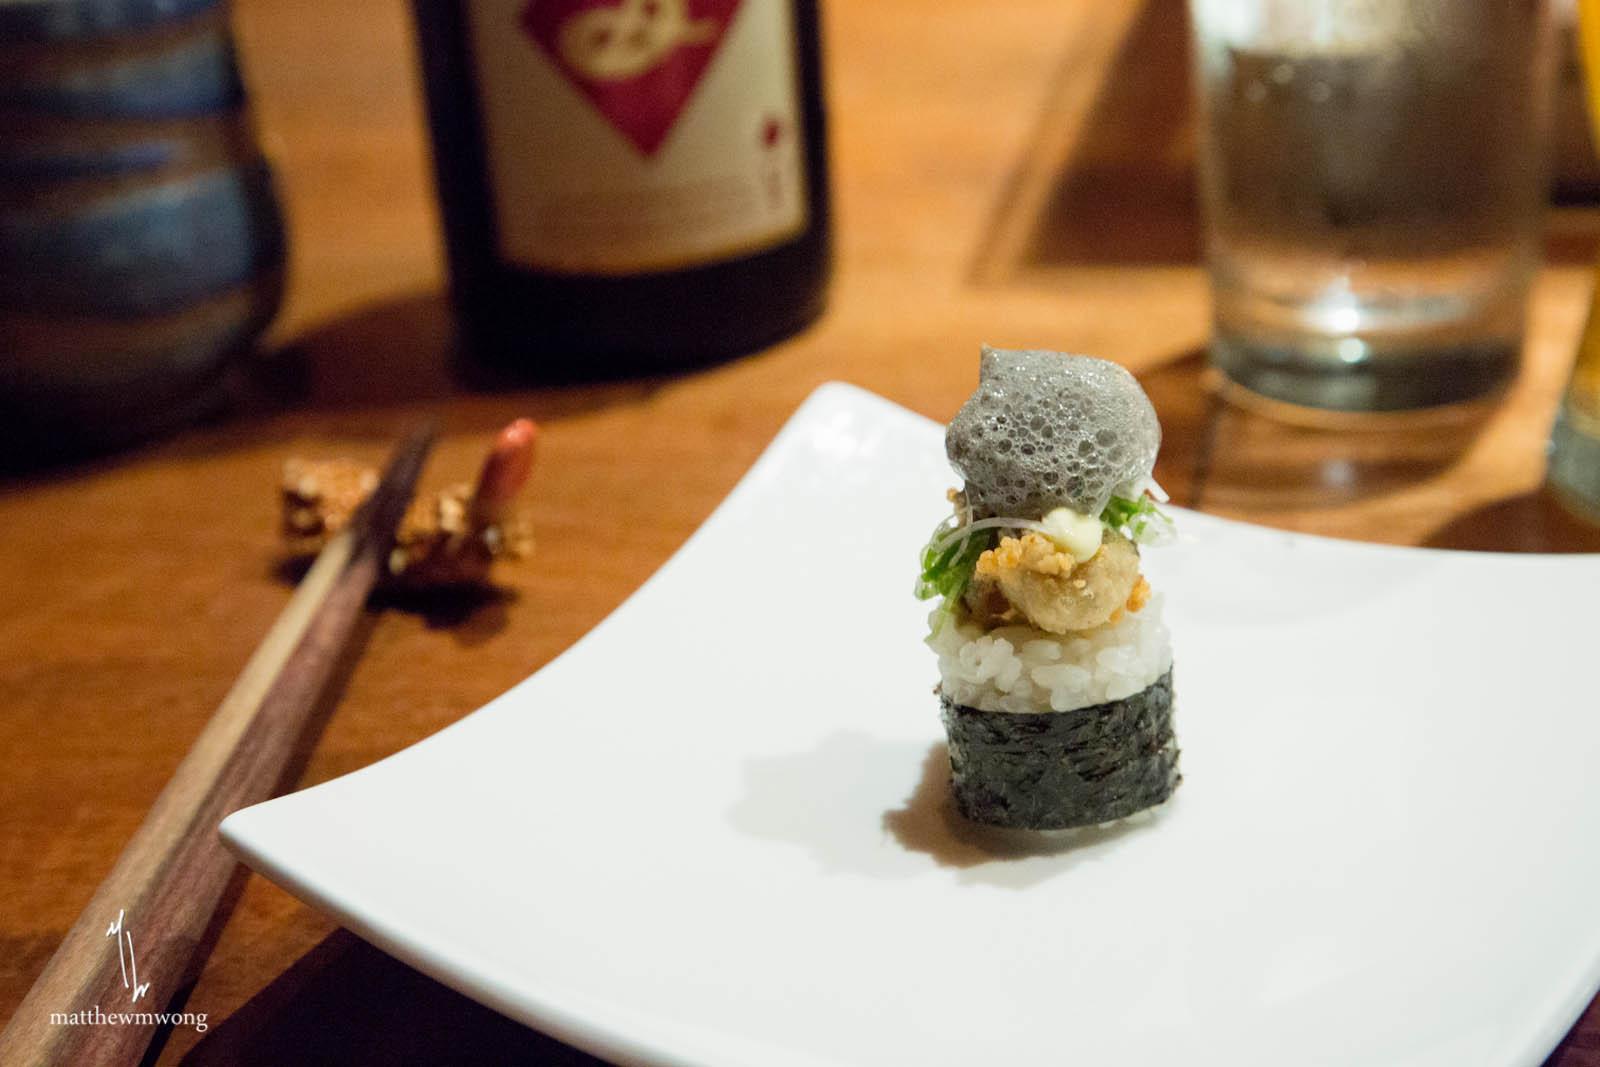 Fried Kumamoto Oyster - yuzu kosho aioli, squid ink bubbles